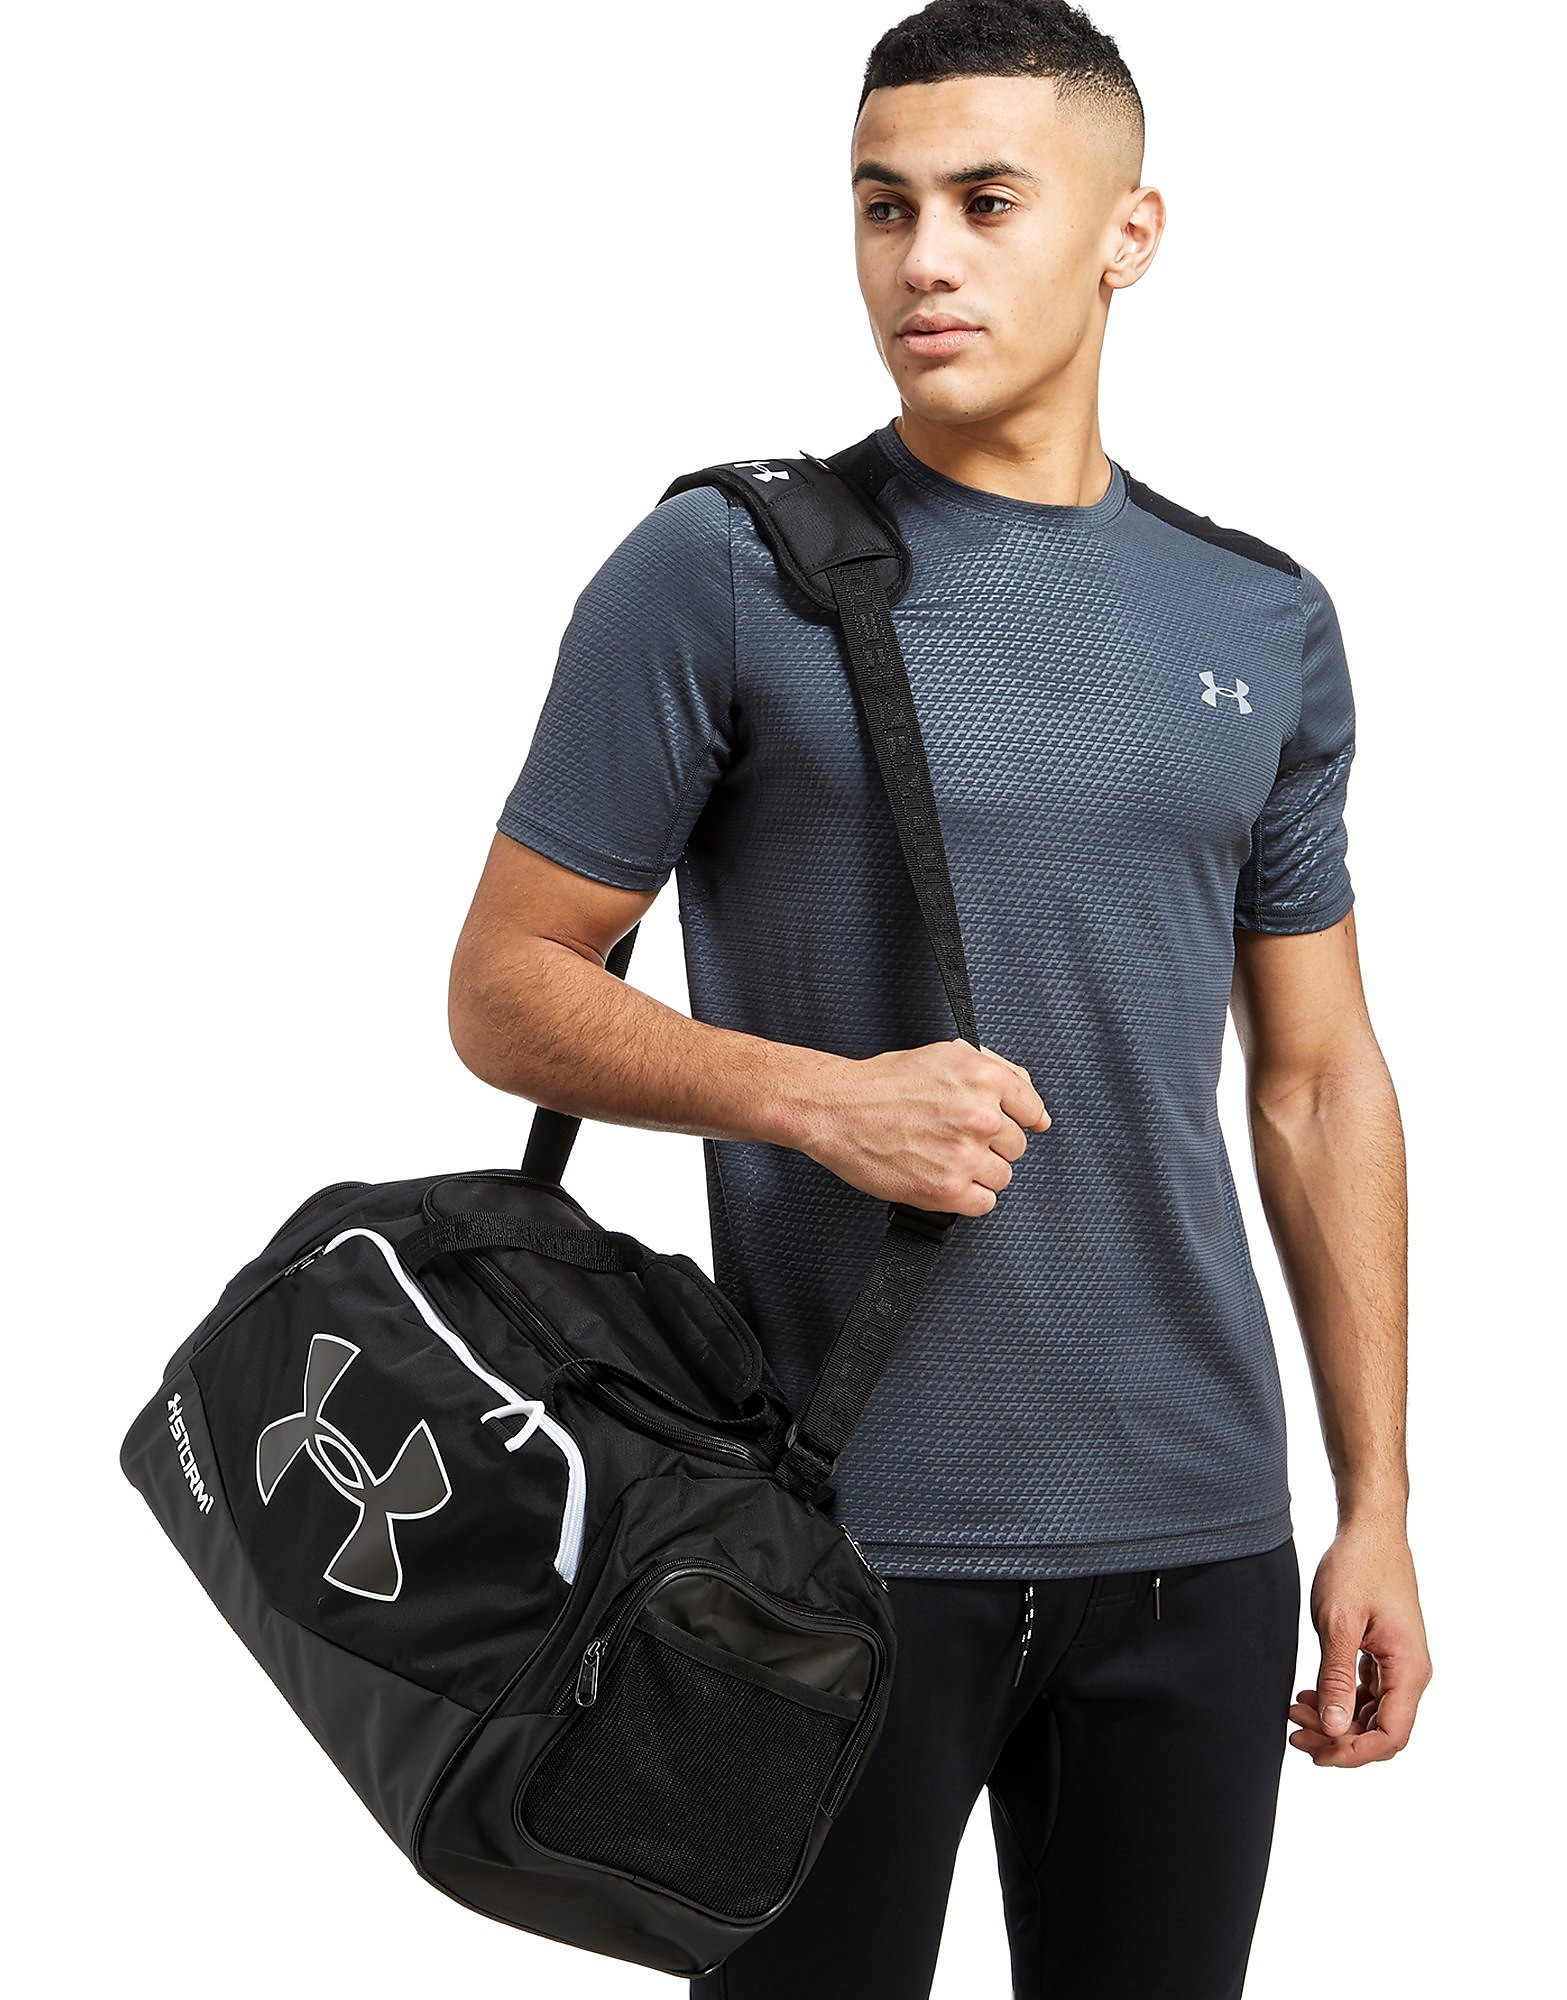 Under Armour Undeniable Duffle Bag